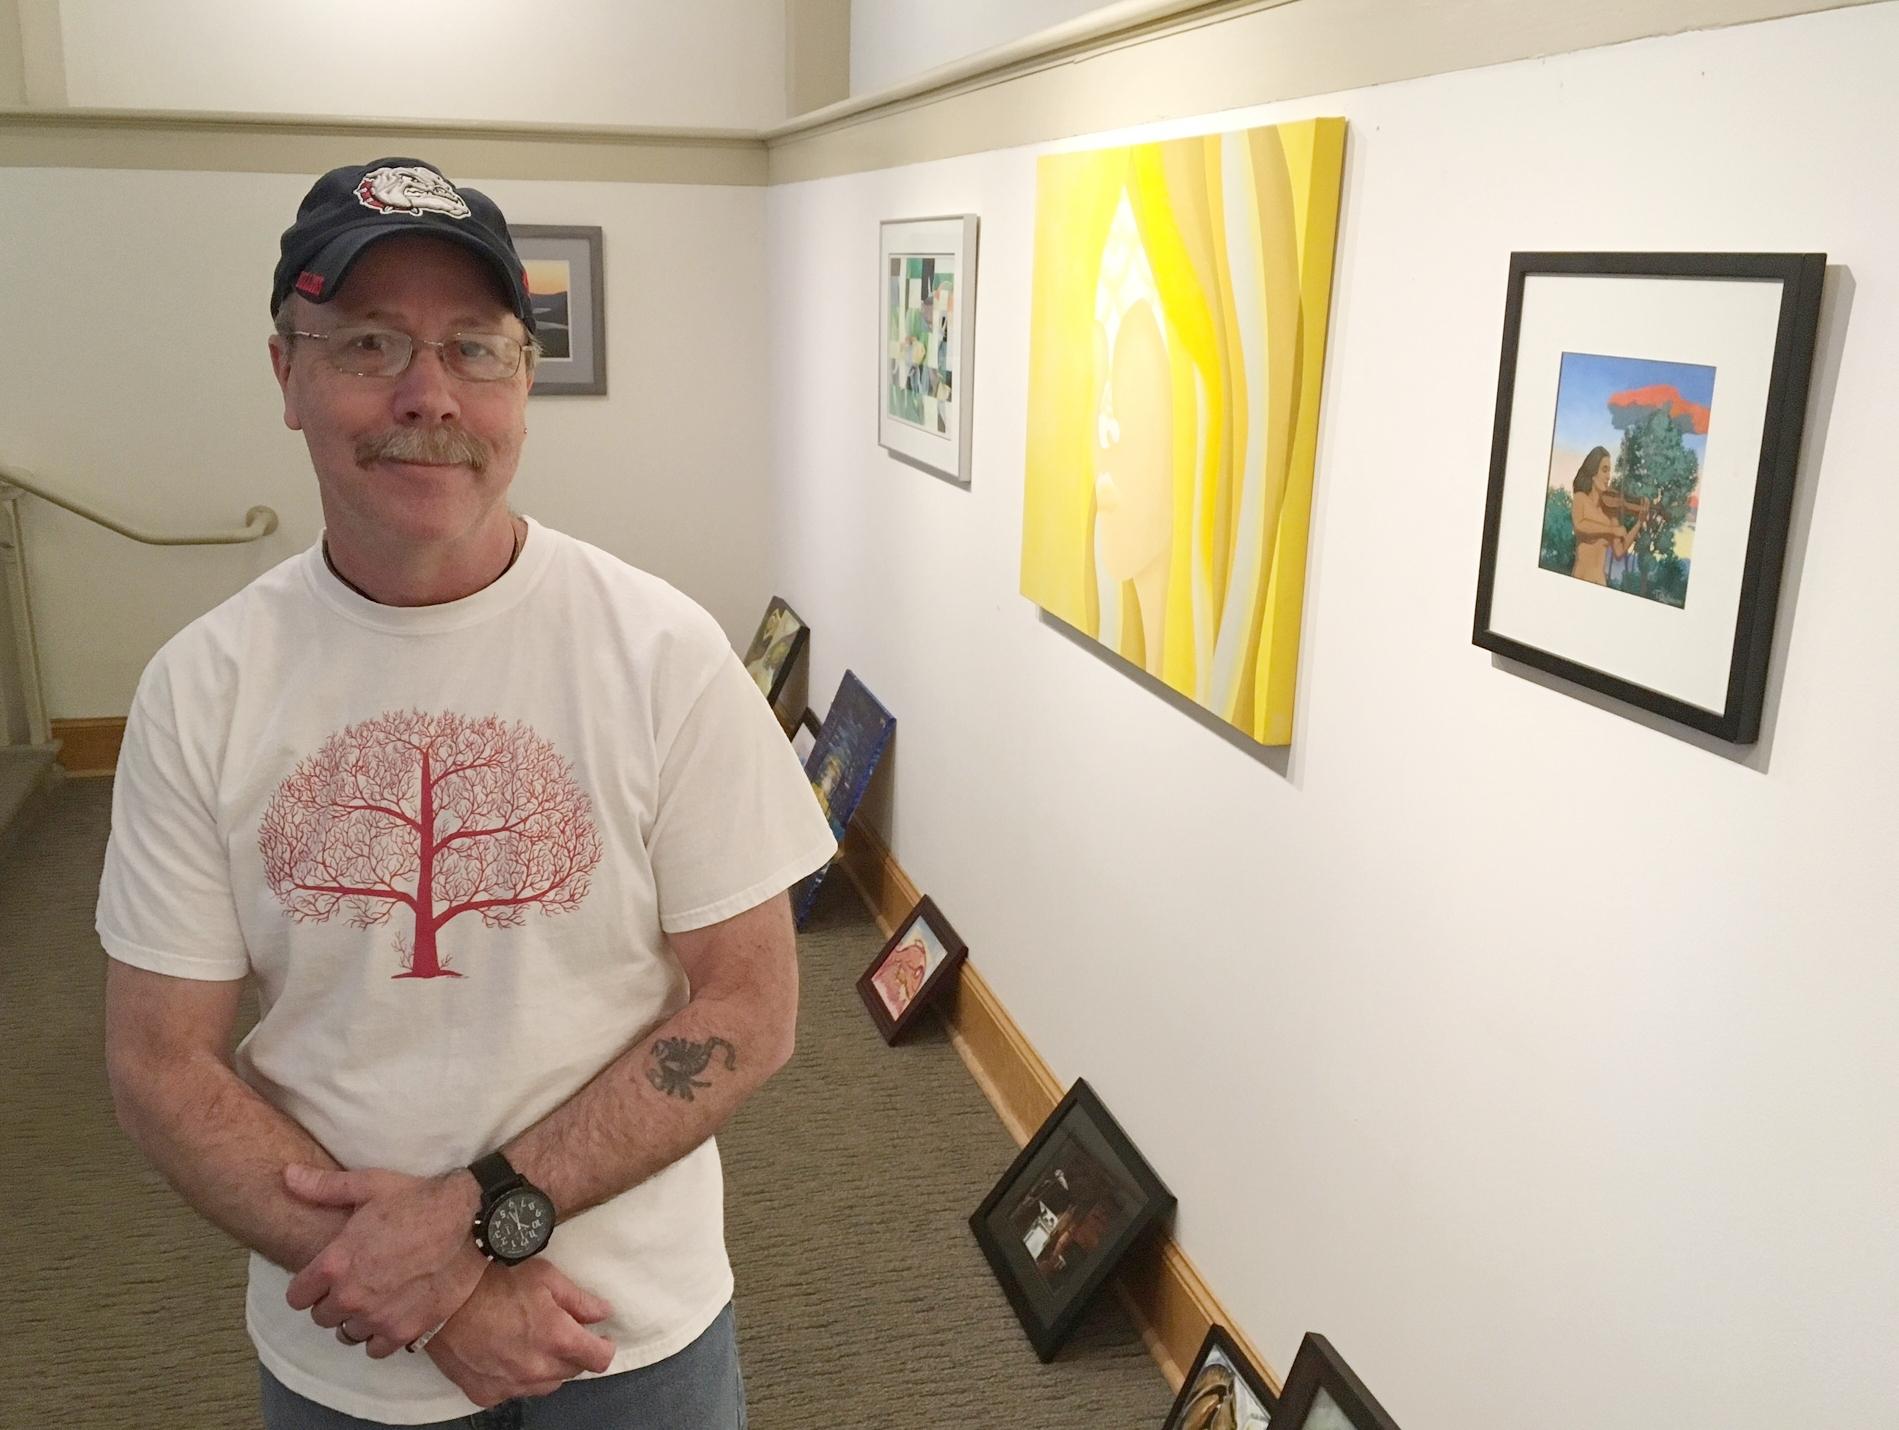 spokane-artist-denny-carman